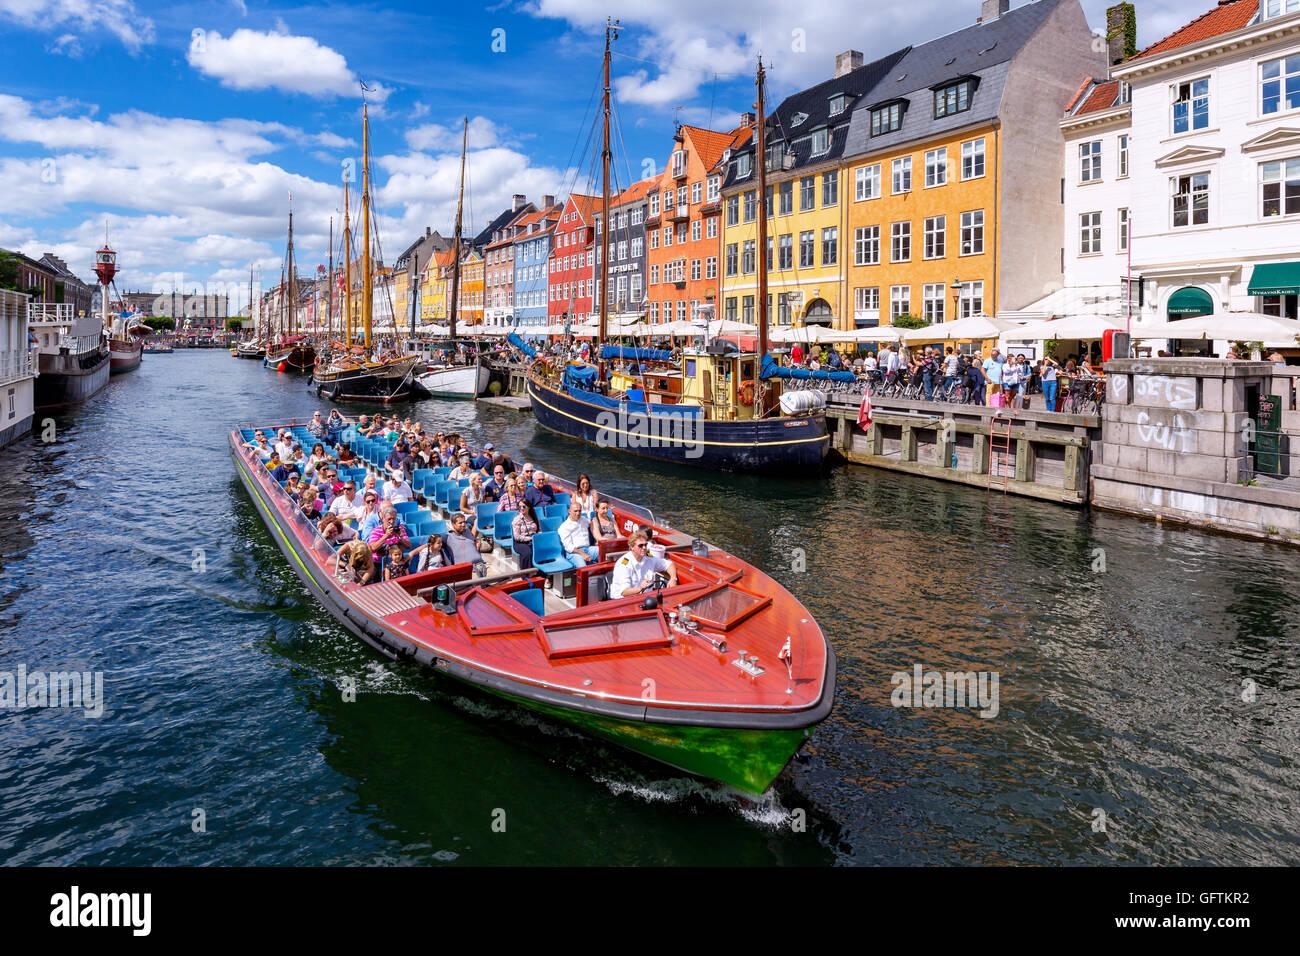 Escursione in barca, Nyhavn canal, Copenhagen, Danimarca Foto Stock